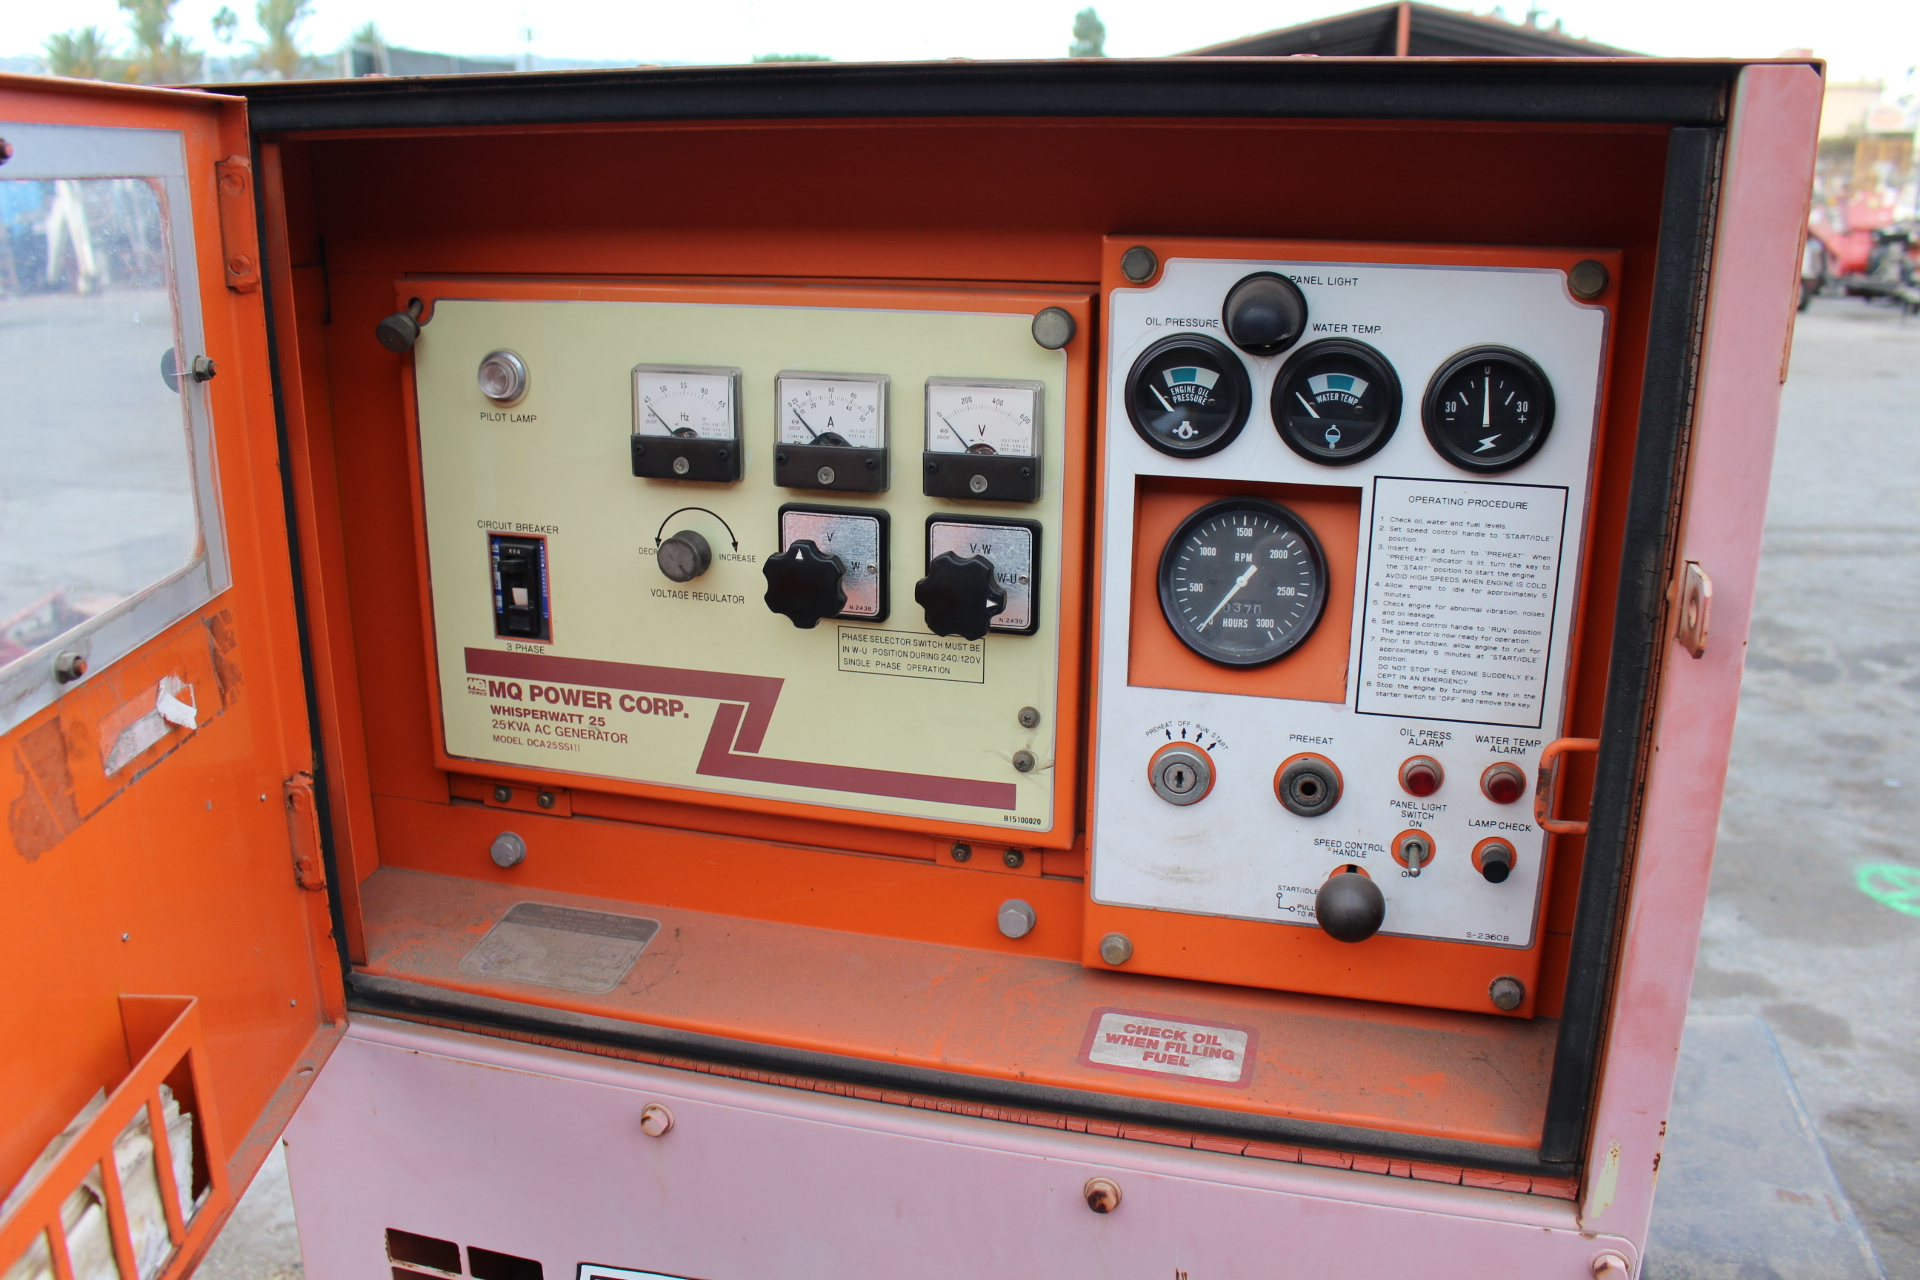 Lot 33 - WHISPERWATT PORTABLE AC GENERATOR, MODEL DCA-25SS, 25 KVA, S/N 3664104, 370 HOURS, TRAILER MOUNTED